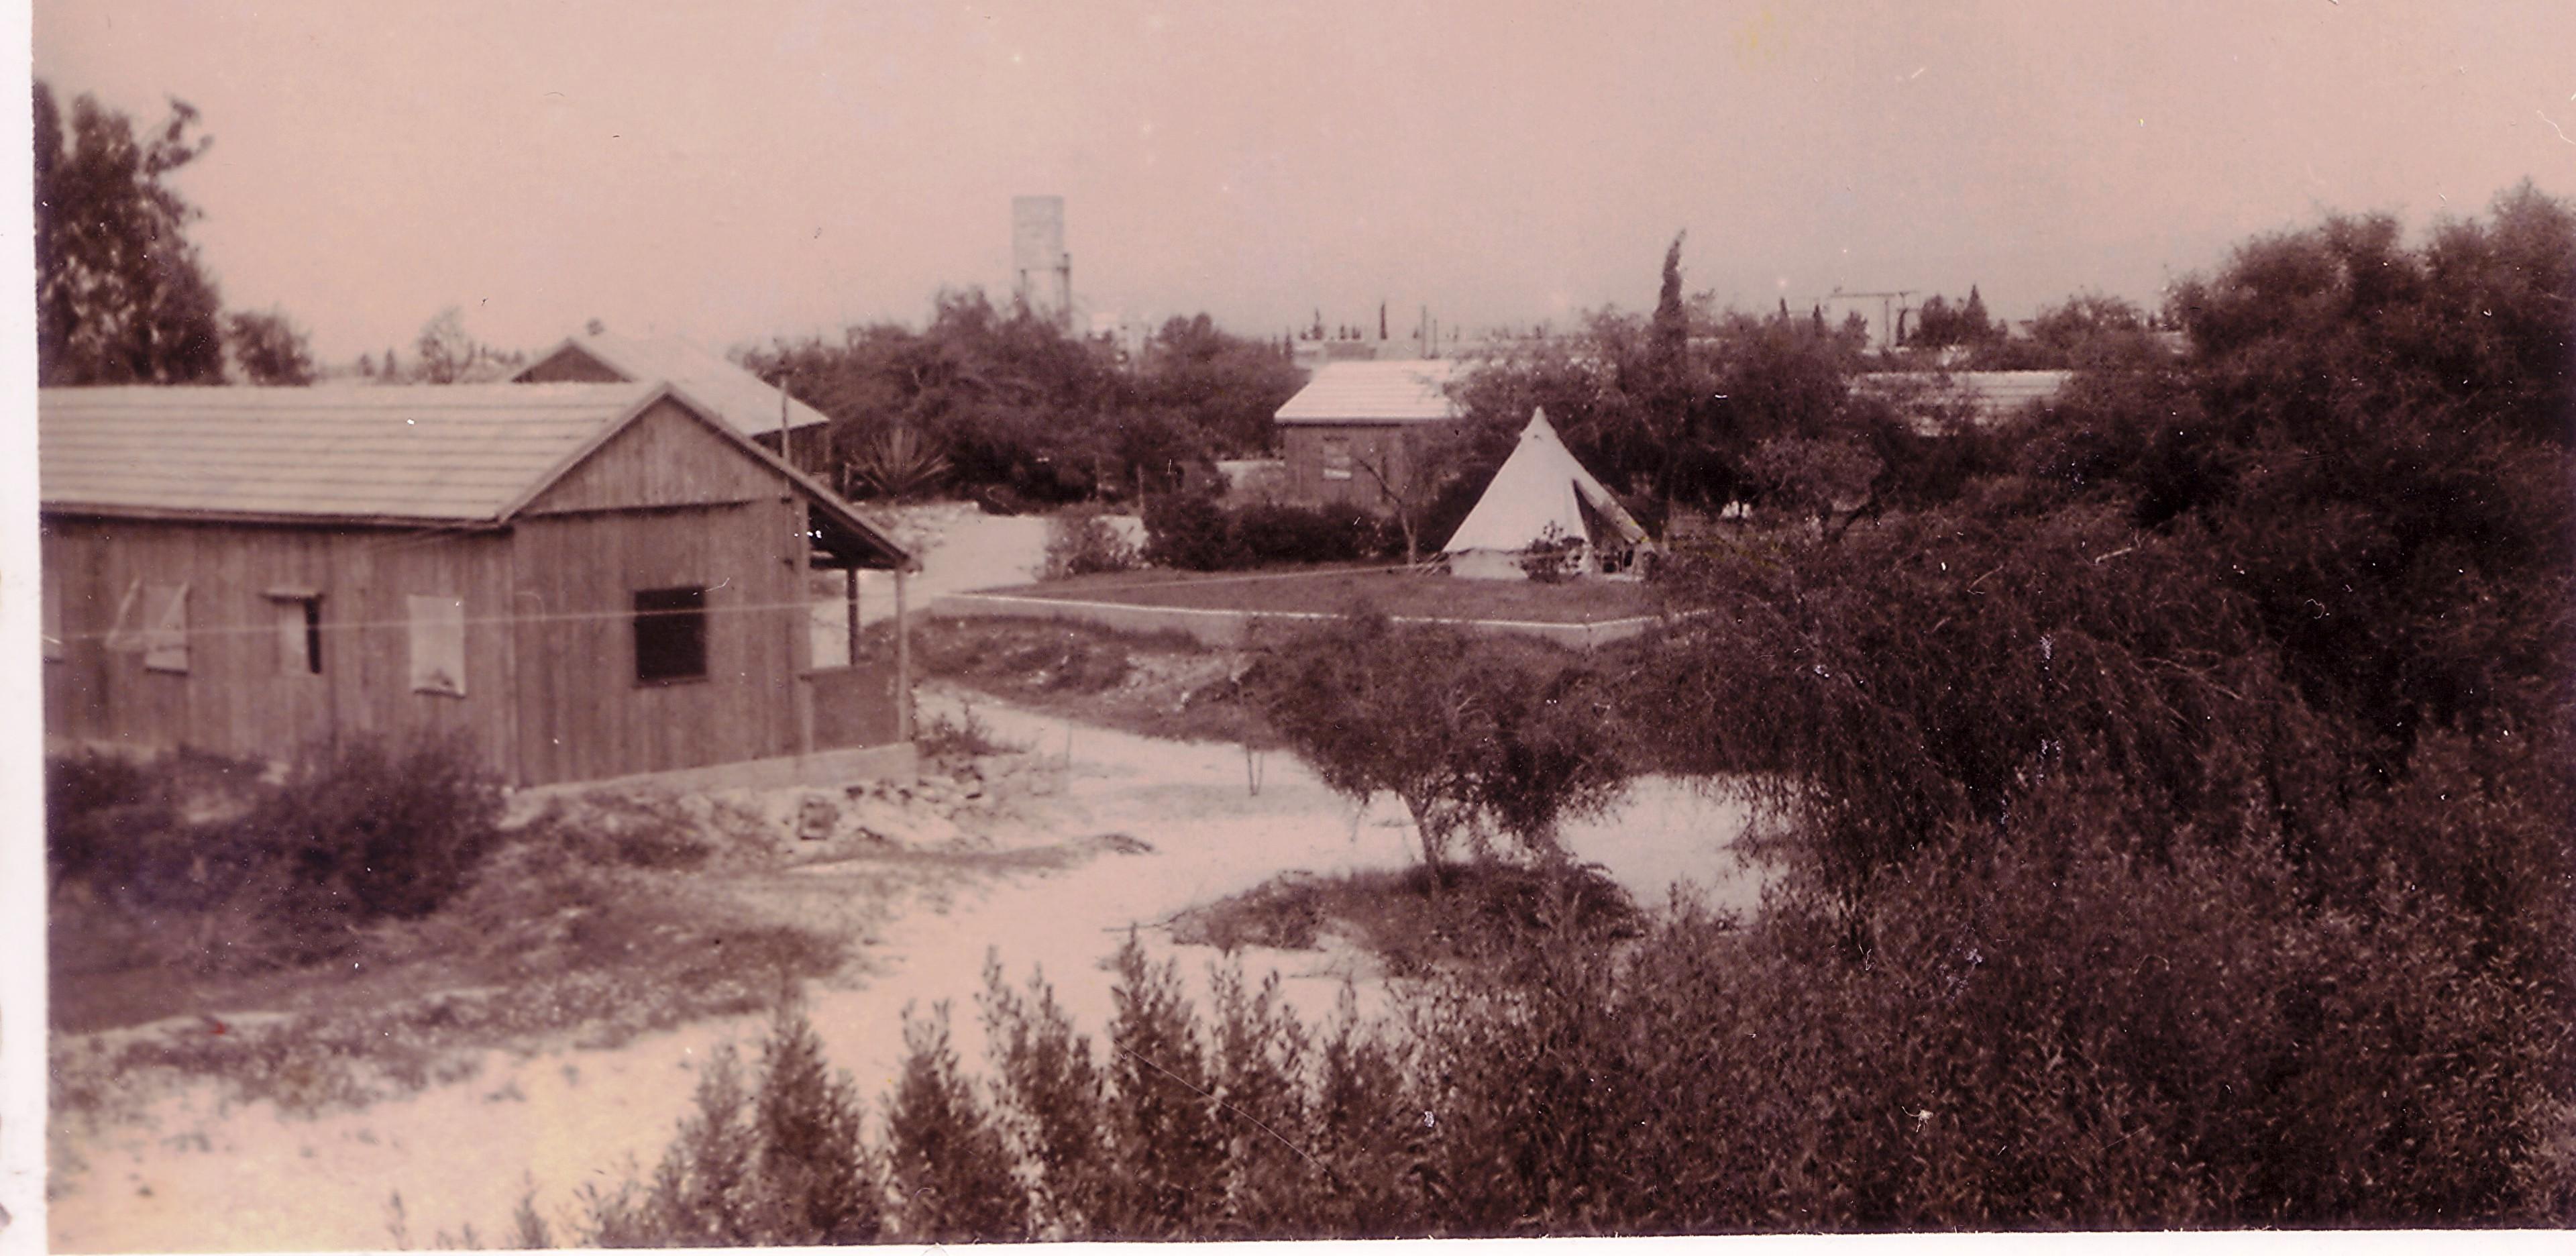 File:PikiWiki Israel 6203 kibbutz kiryat haim 1942.jpg ... Pictures Kibbutz Hahotrim